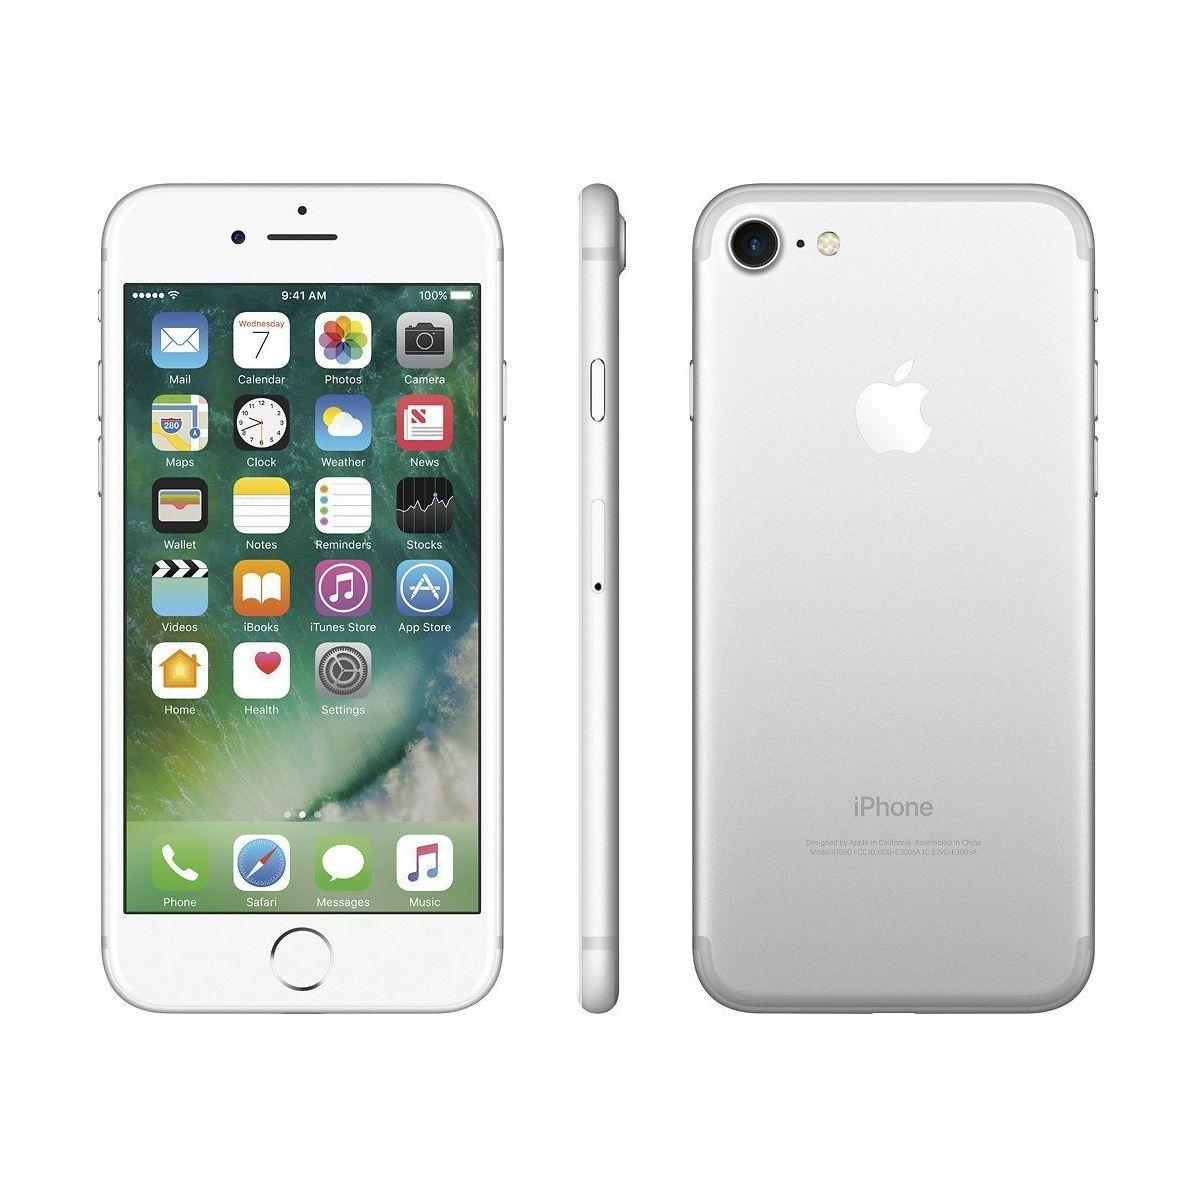 Apple Iphone 7 A1660 32gb Smartphone Verizon Unlocked Iphone Iphone 7 Apple Iphone 7 32gb